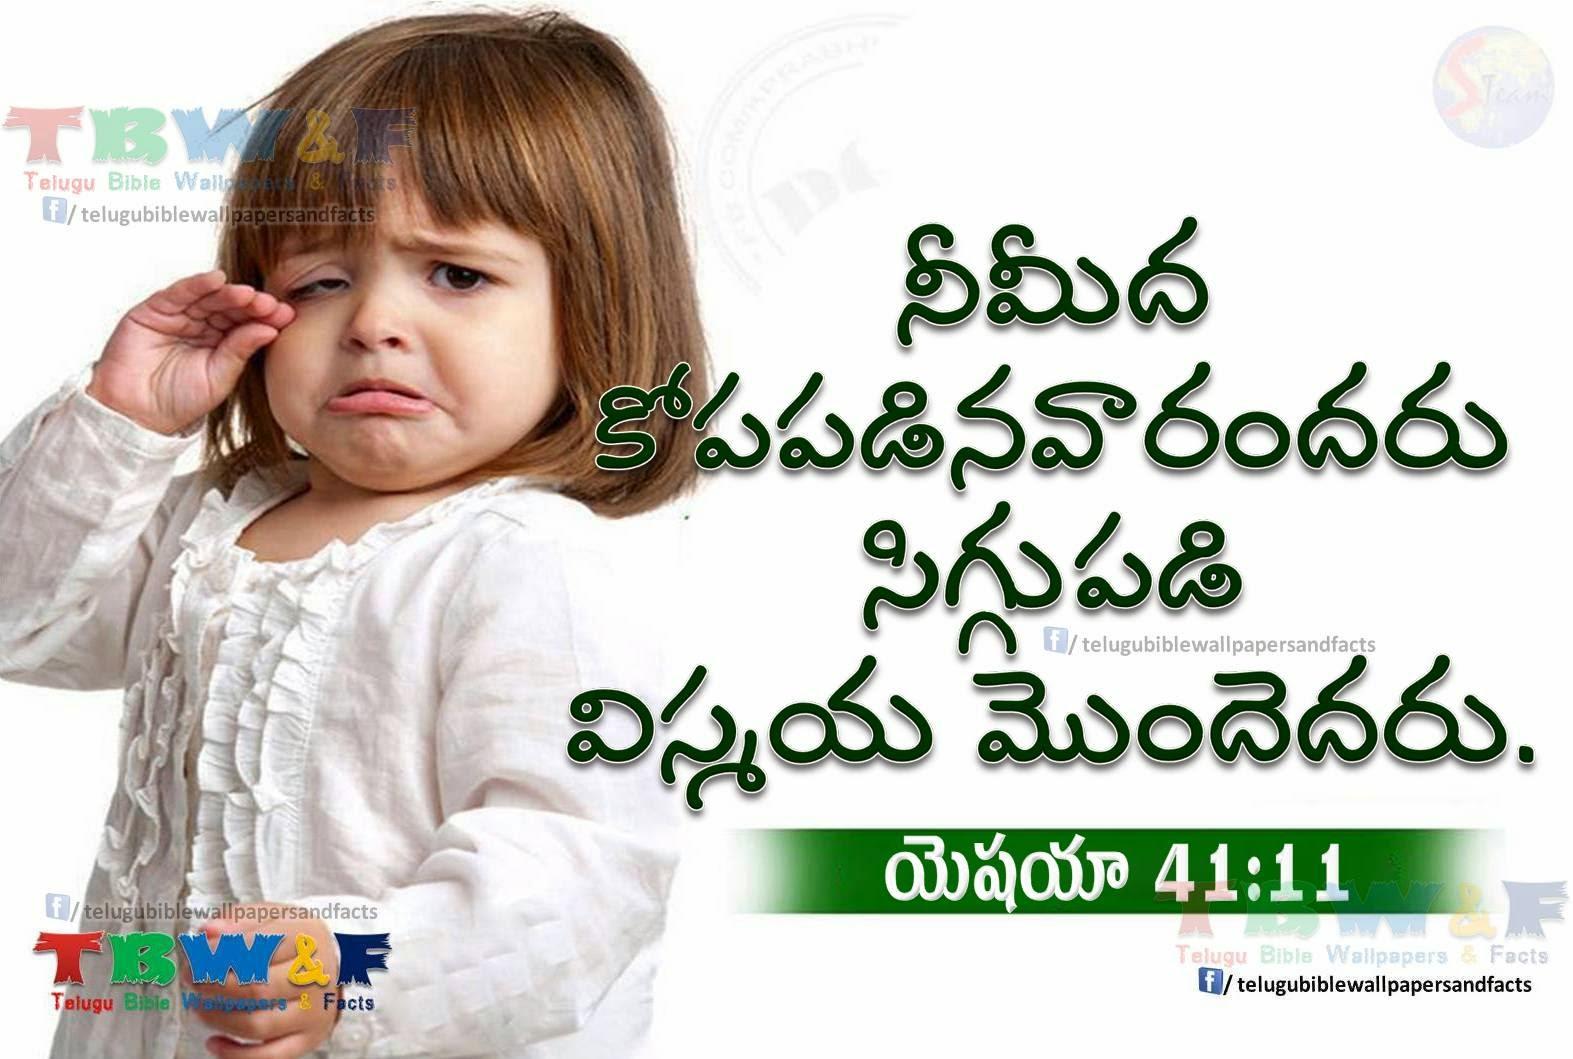 Telugu Christian Wallpapers ~ The Christian Messenger